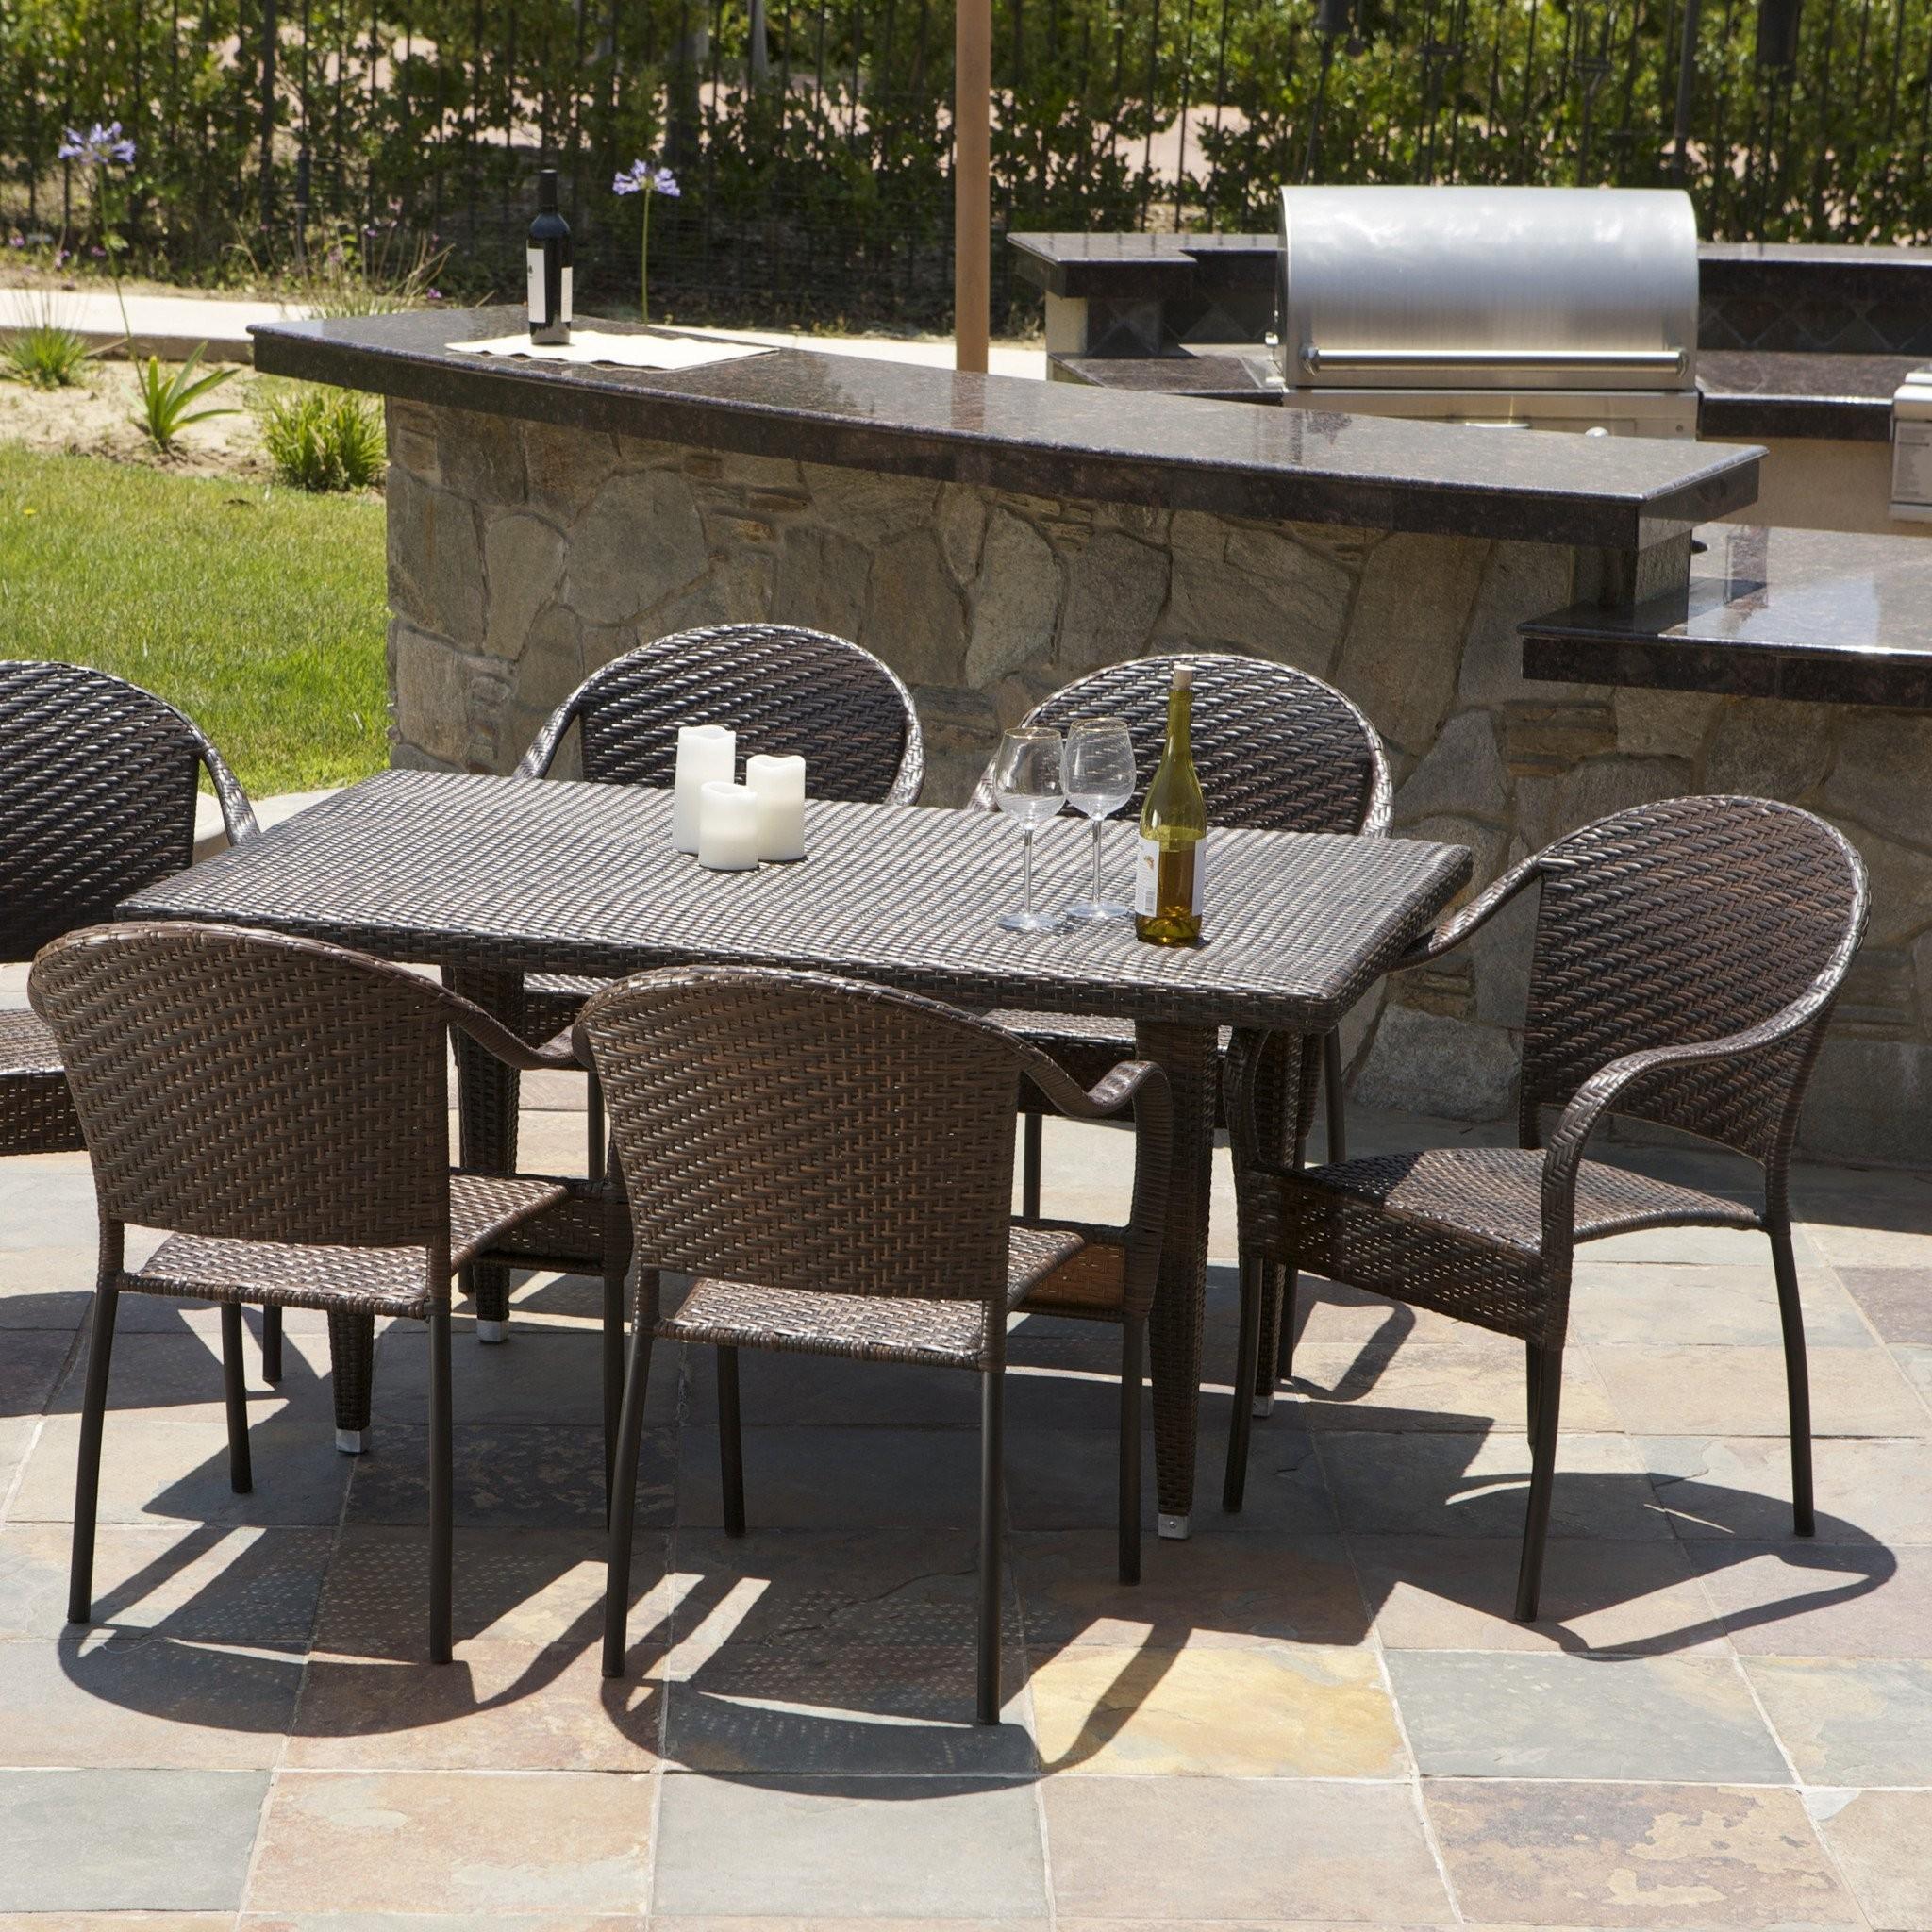 Livingston 7 Piece Wicker Outdoor Dining Set